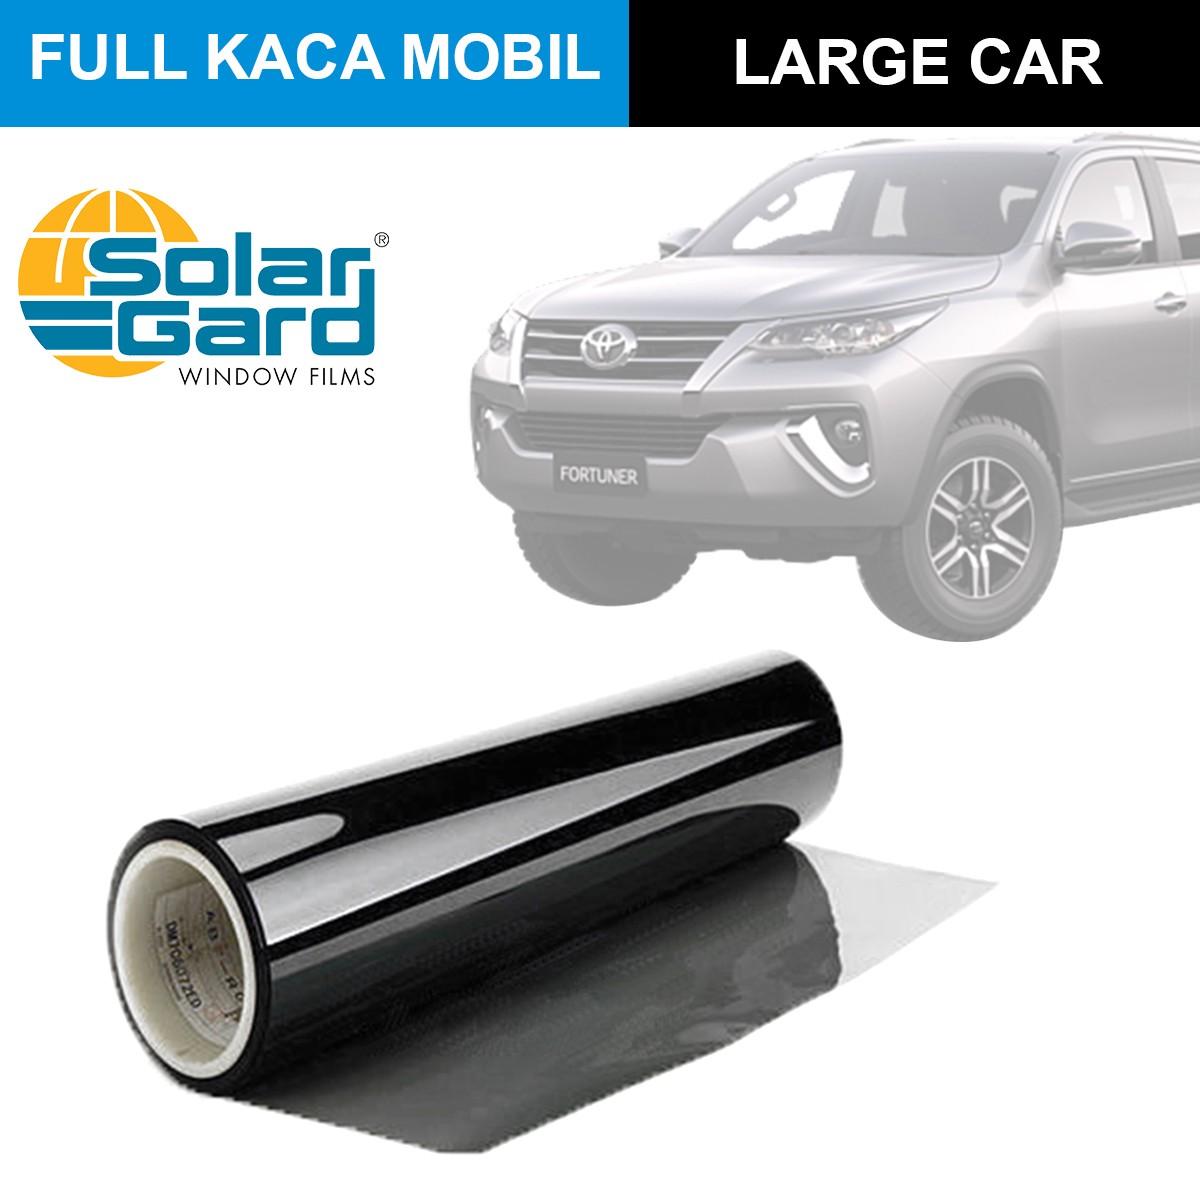 KACA FILM SOLAR GARD PLATINUM PERFORMANCE - (LARGE CAR) FULL KACA